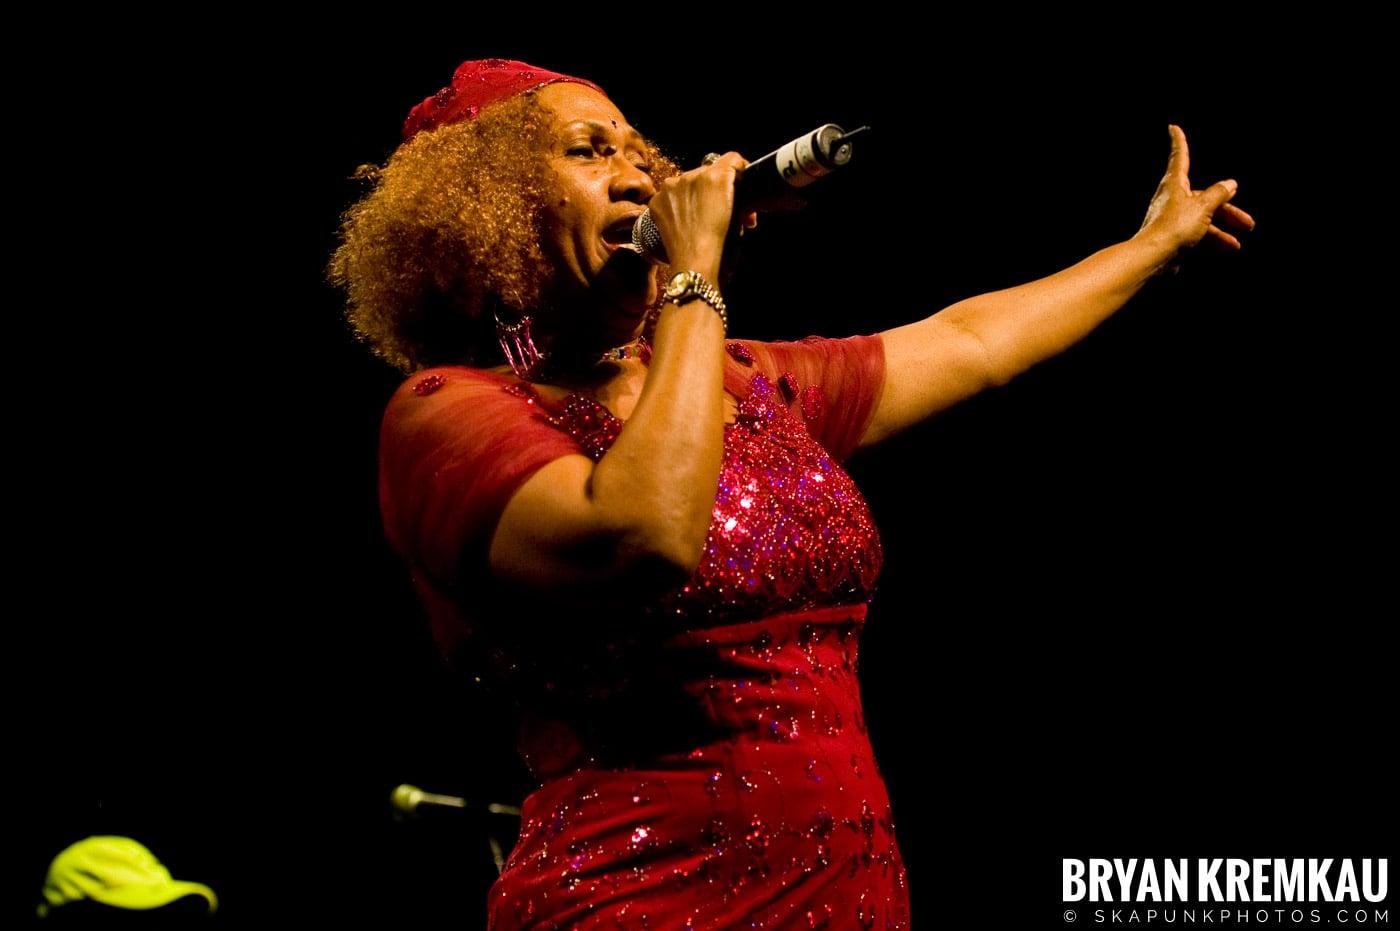 Marcia Griffiths @ Vintage Reggae Fest - Hammerstein Ballroom, NYC - 12.16.2007 (10)